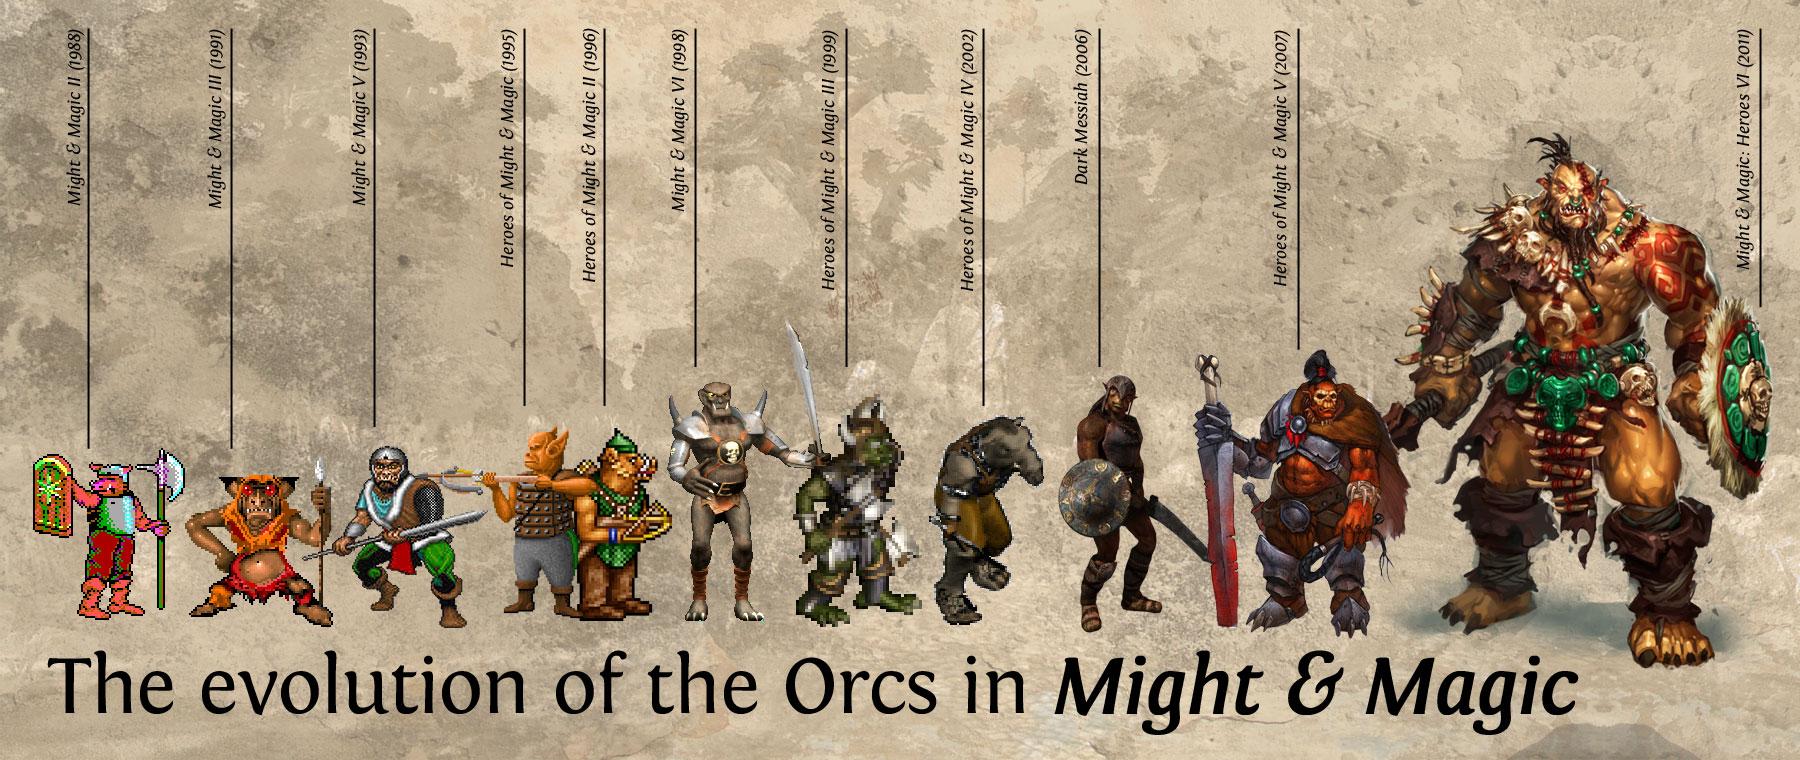 Orcs stories smut scenes